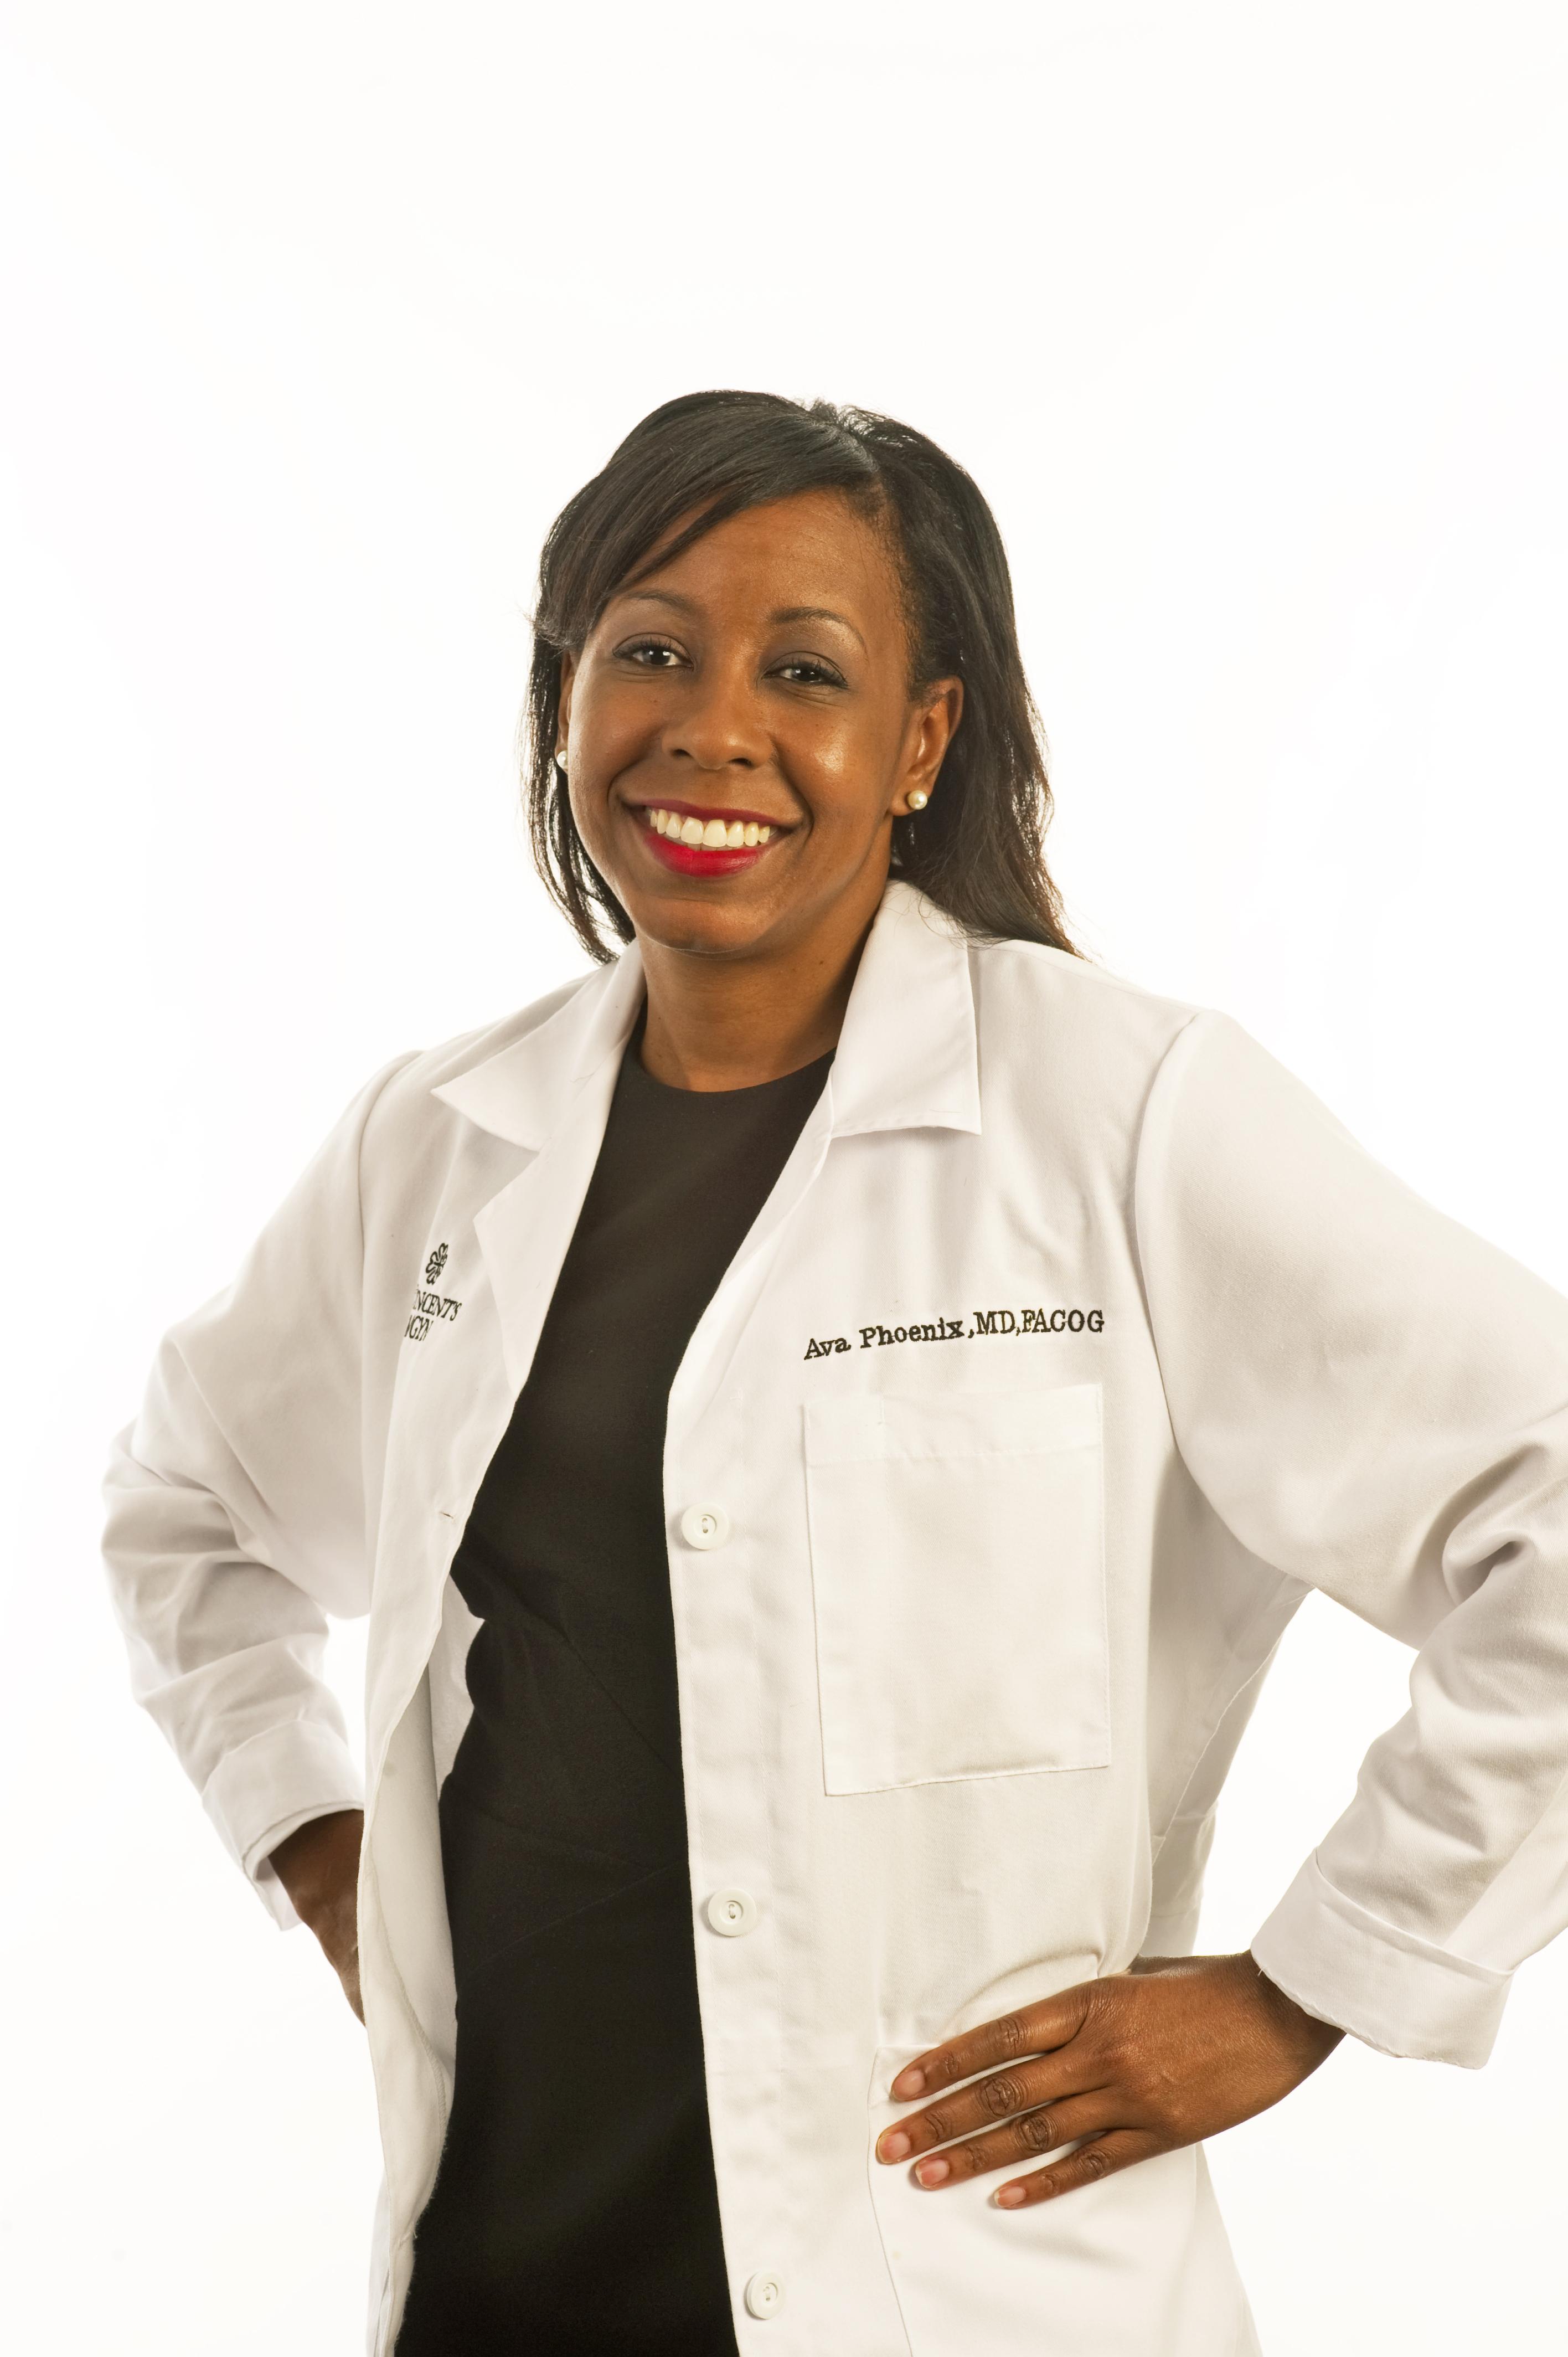 Ava Eugenia Phoenix MD - Obstetrics/Gynecology | Ascension